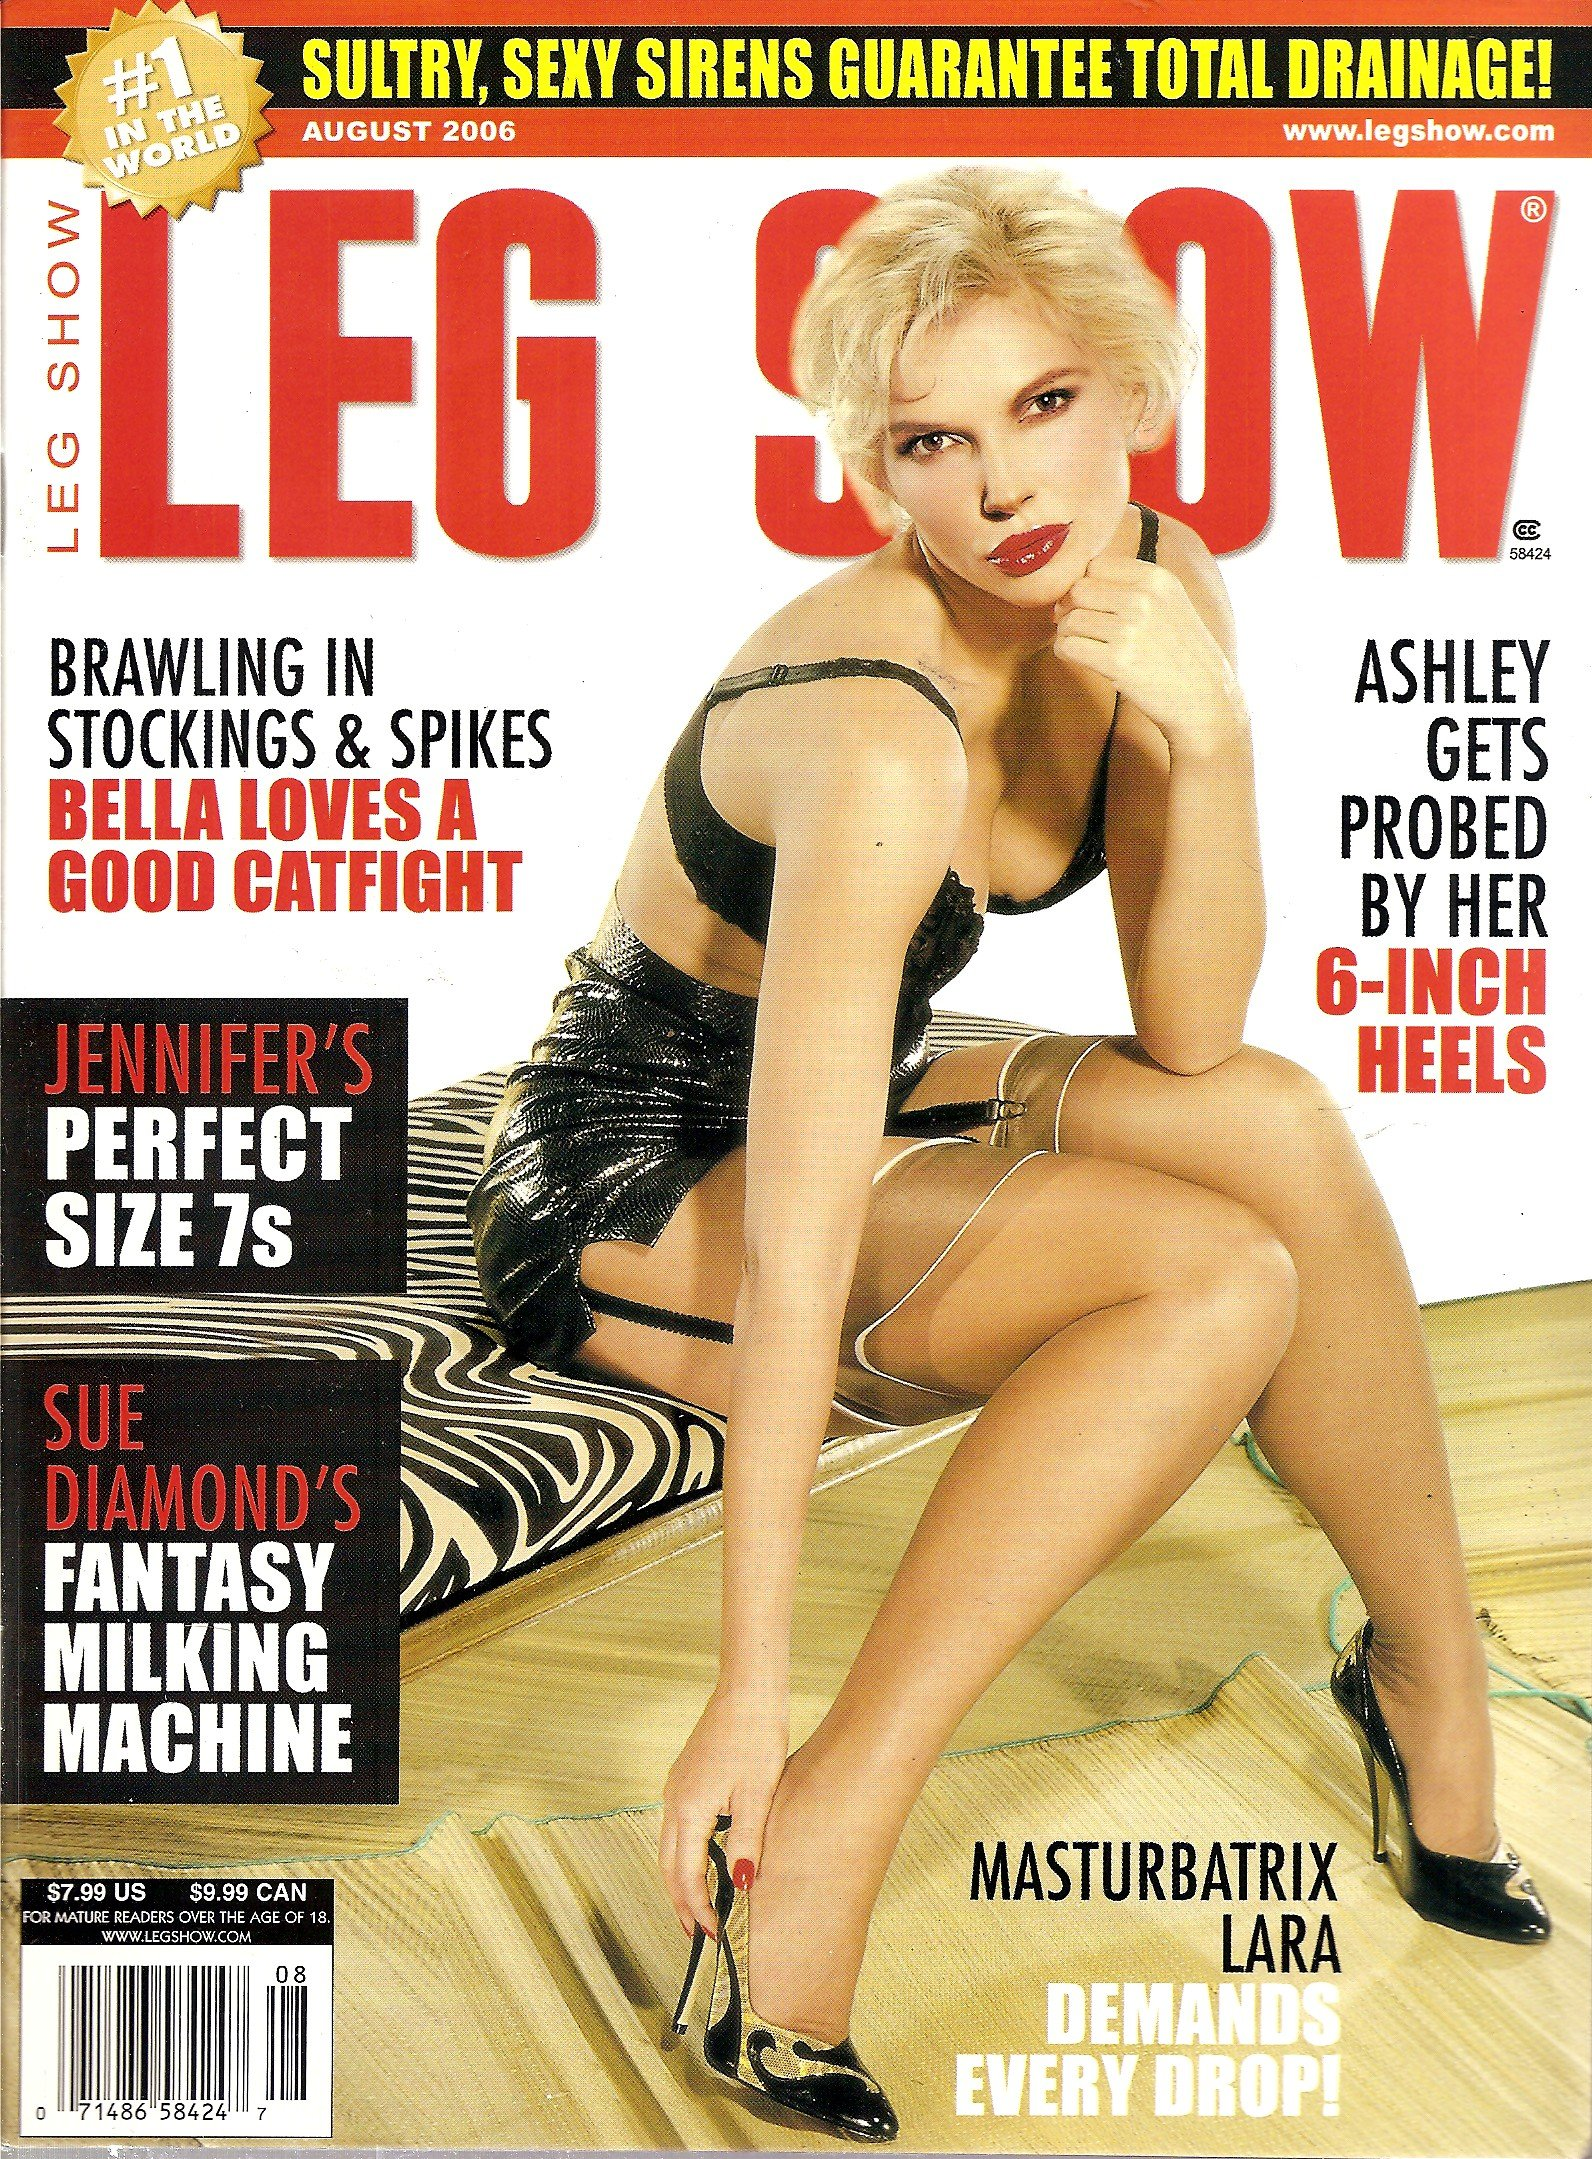 Legshow images.tinydeal.com